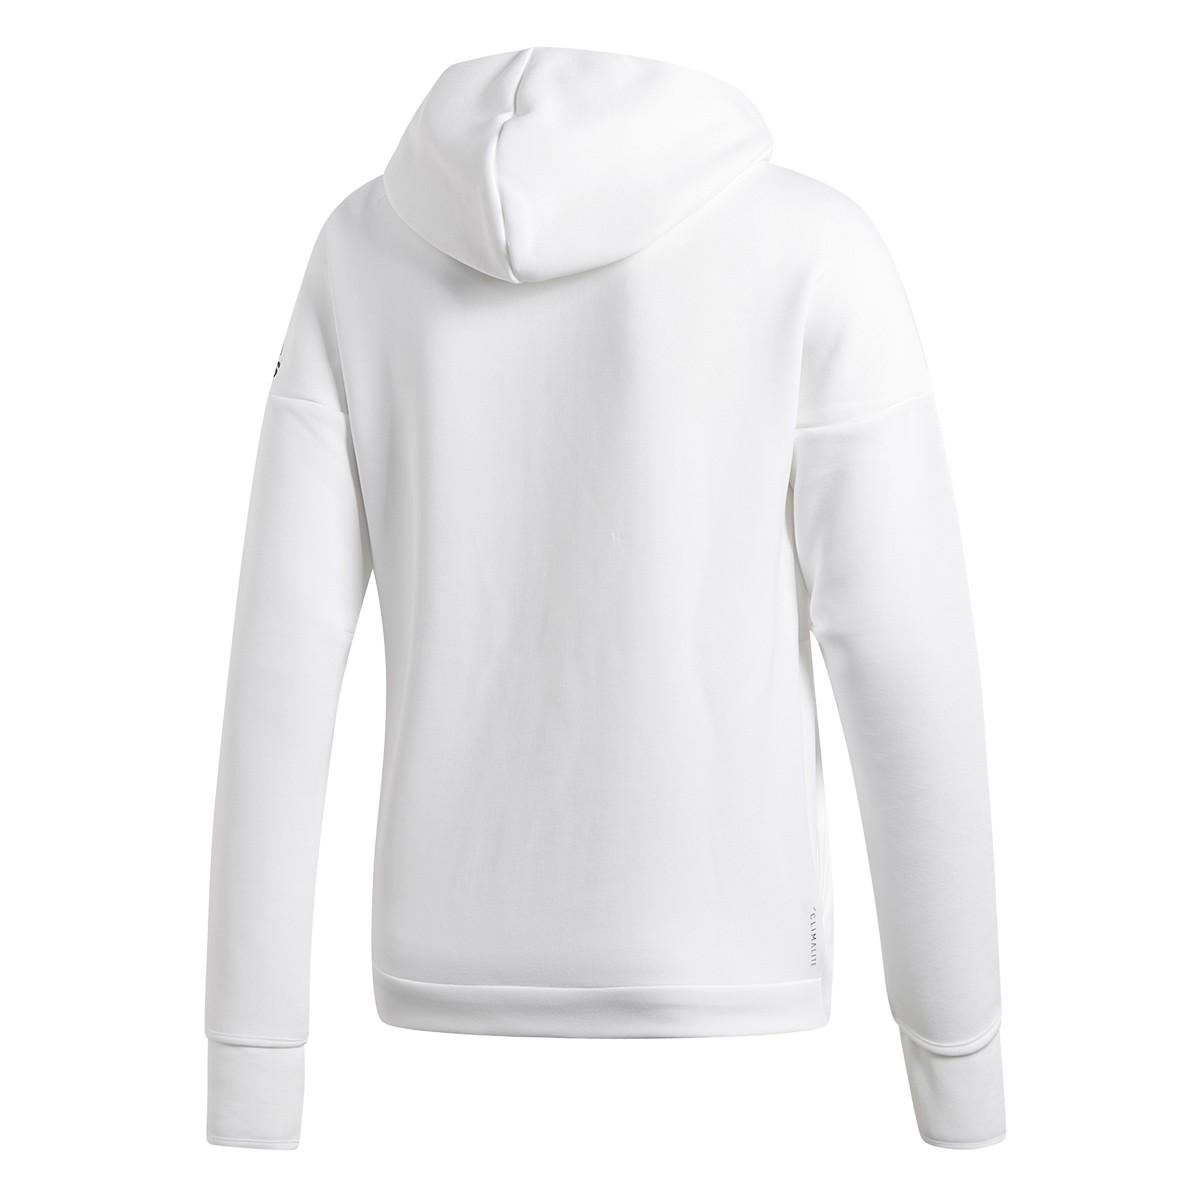 Sweatshirt adidas ZNE Fast Release White Loja de futebol